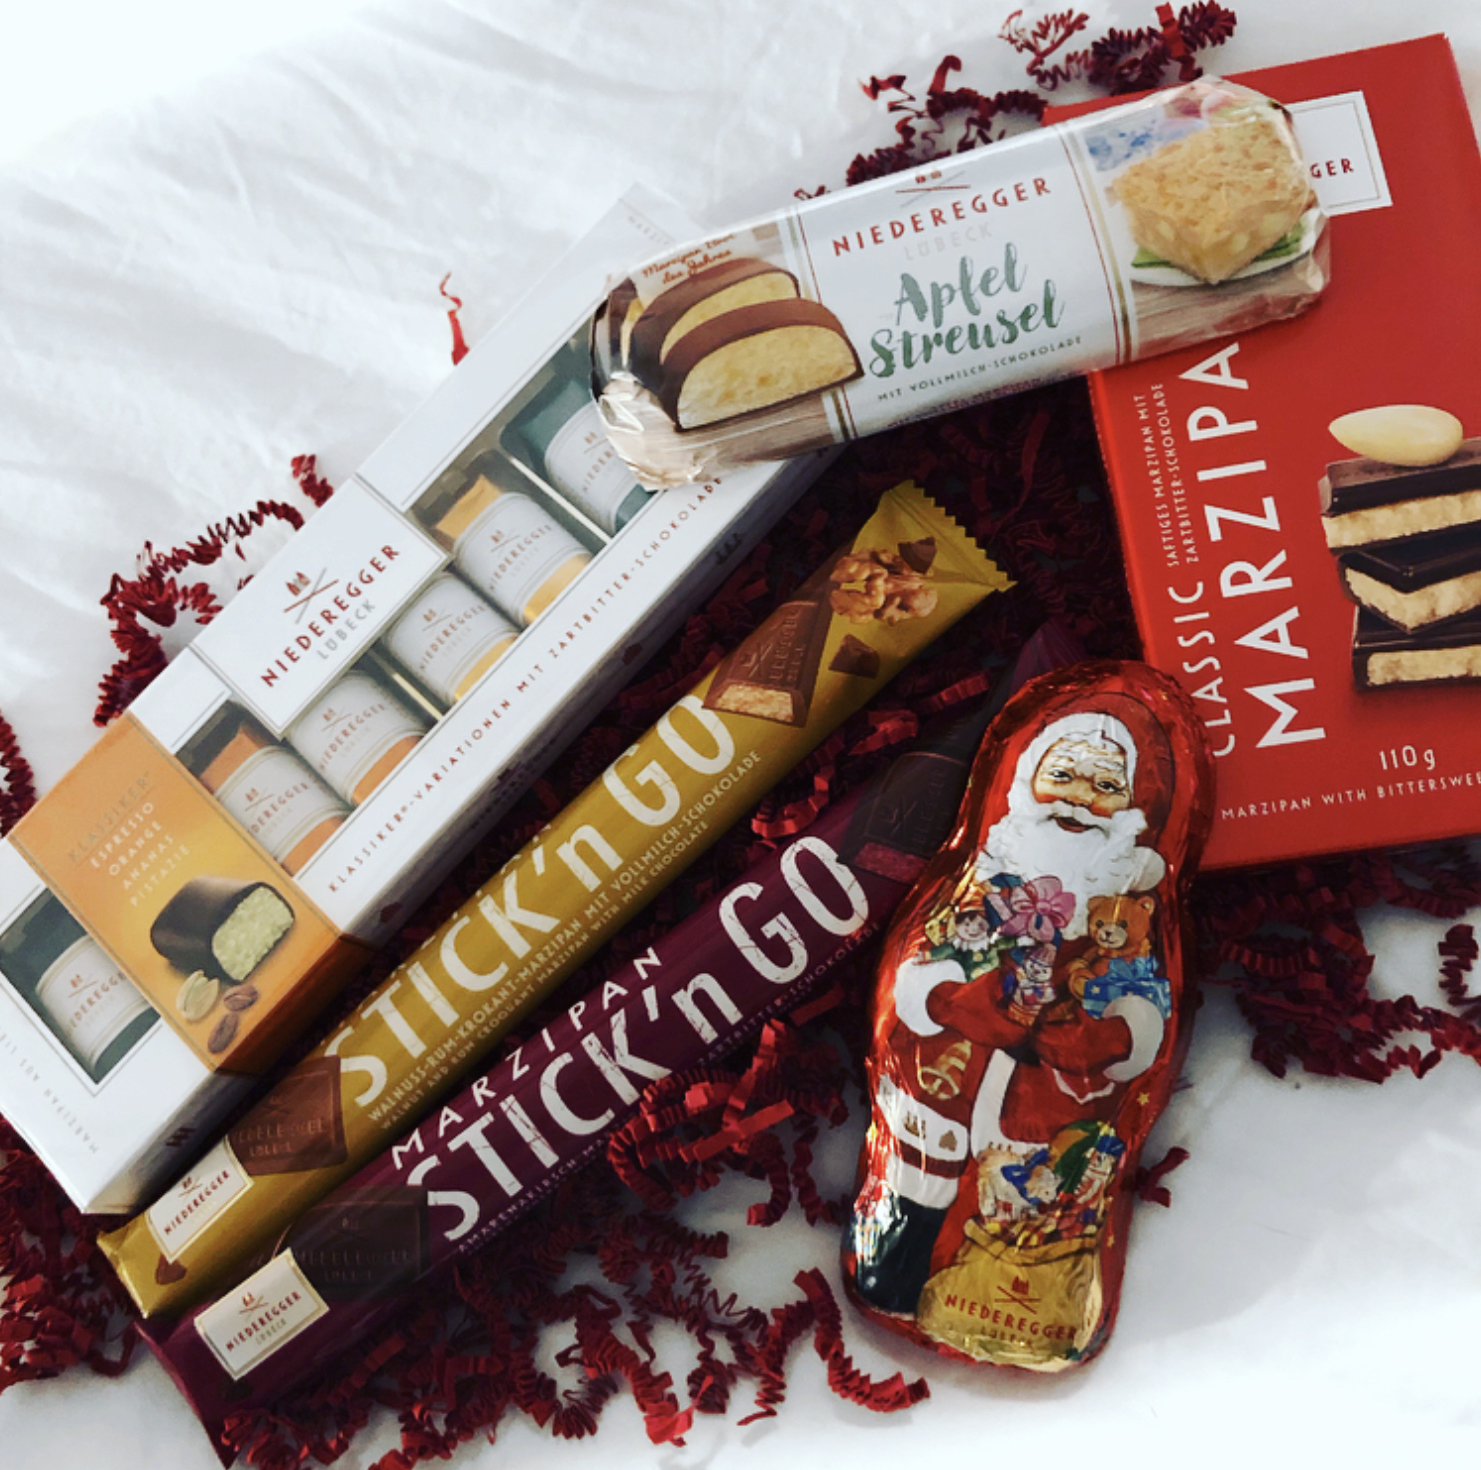 Niederegger Marzipan - The perfect Christmas Gift